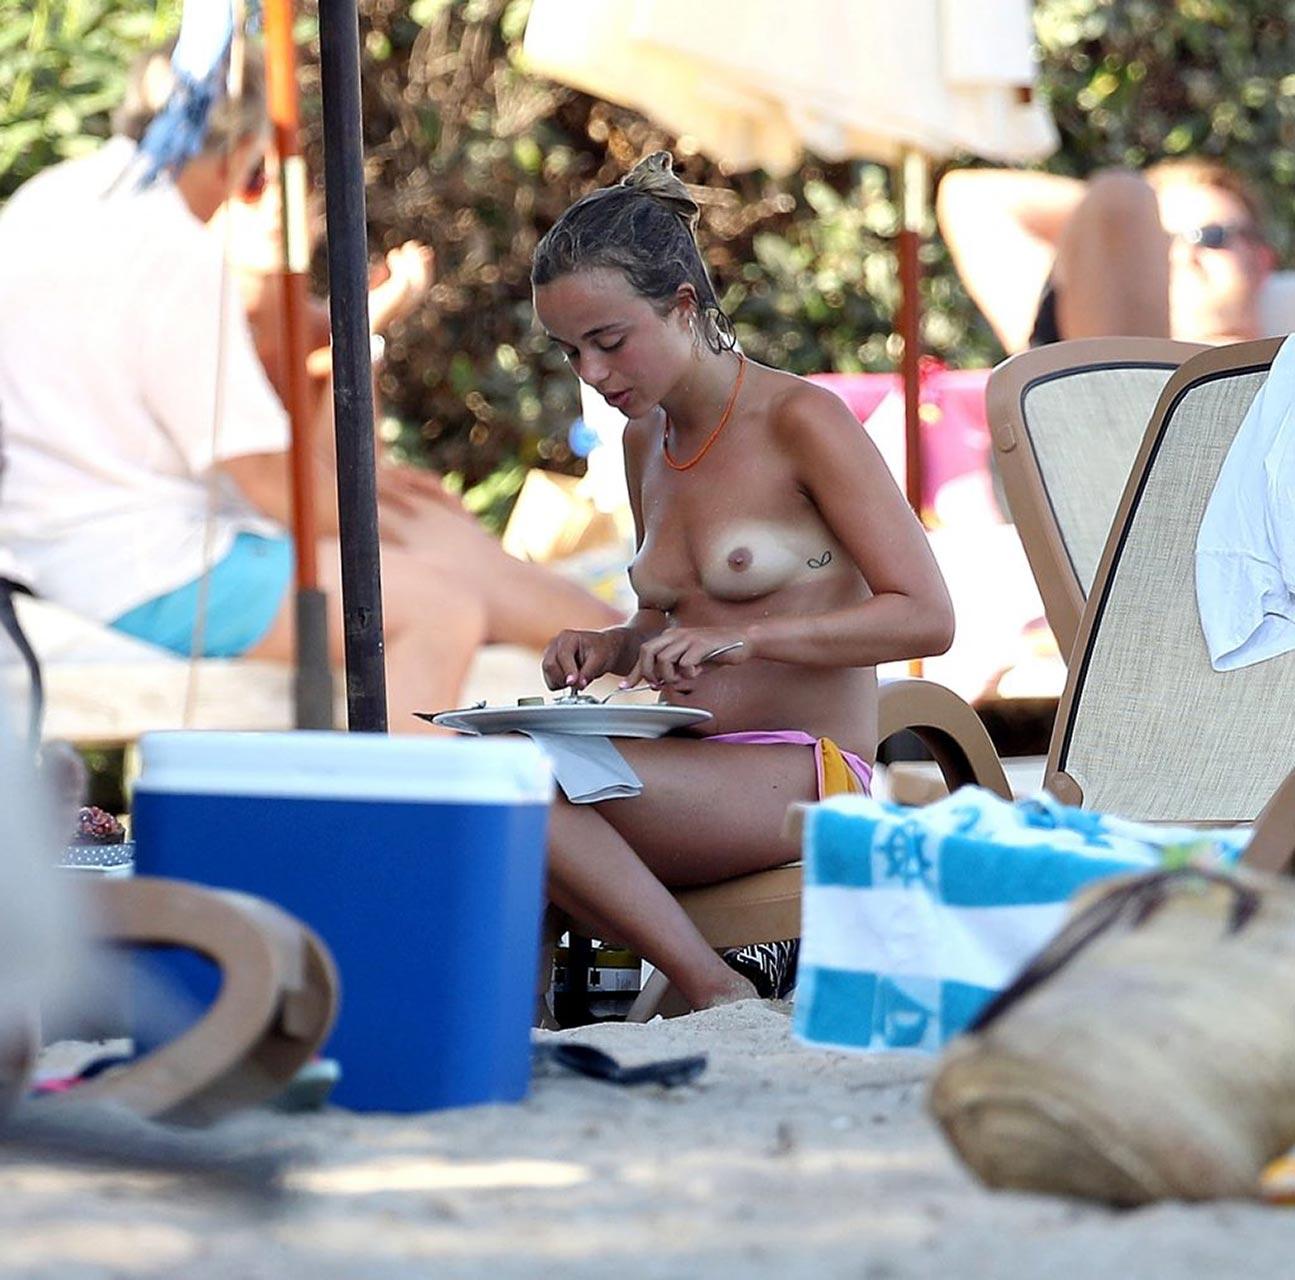 foto Amelia windsor topless